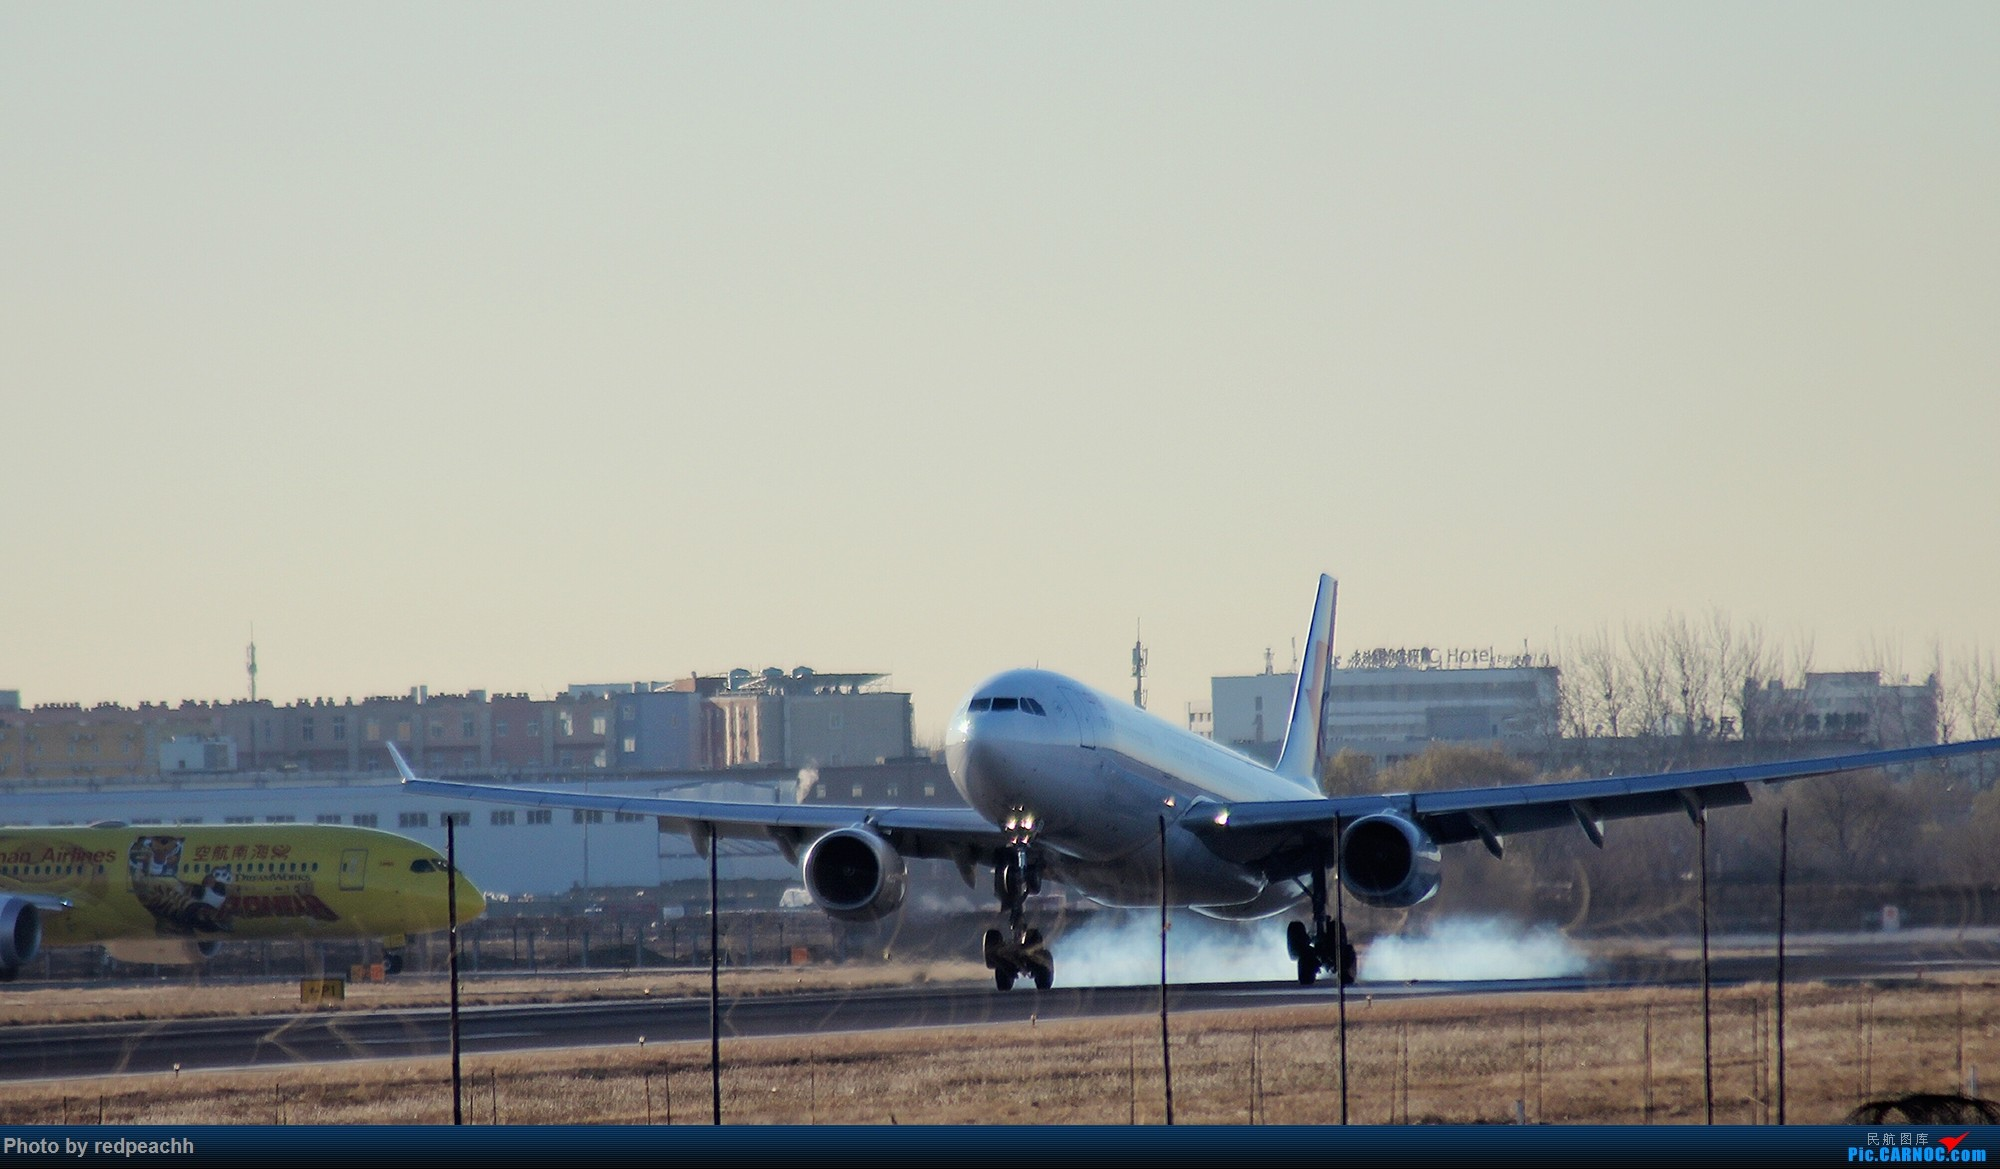 Re:[原创]河北人为拍机而首都机场2日游(杨二营、八卦台)虽均为常规货但值得纪念(36L) AIRBUS A330-300 B-6095 中国北京首都国际机场